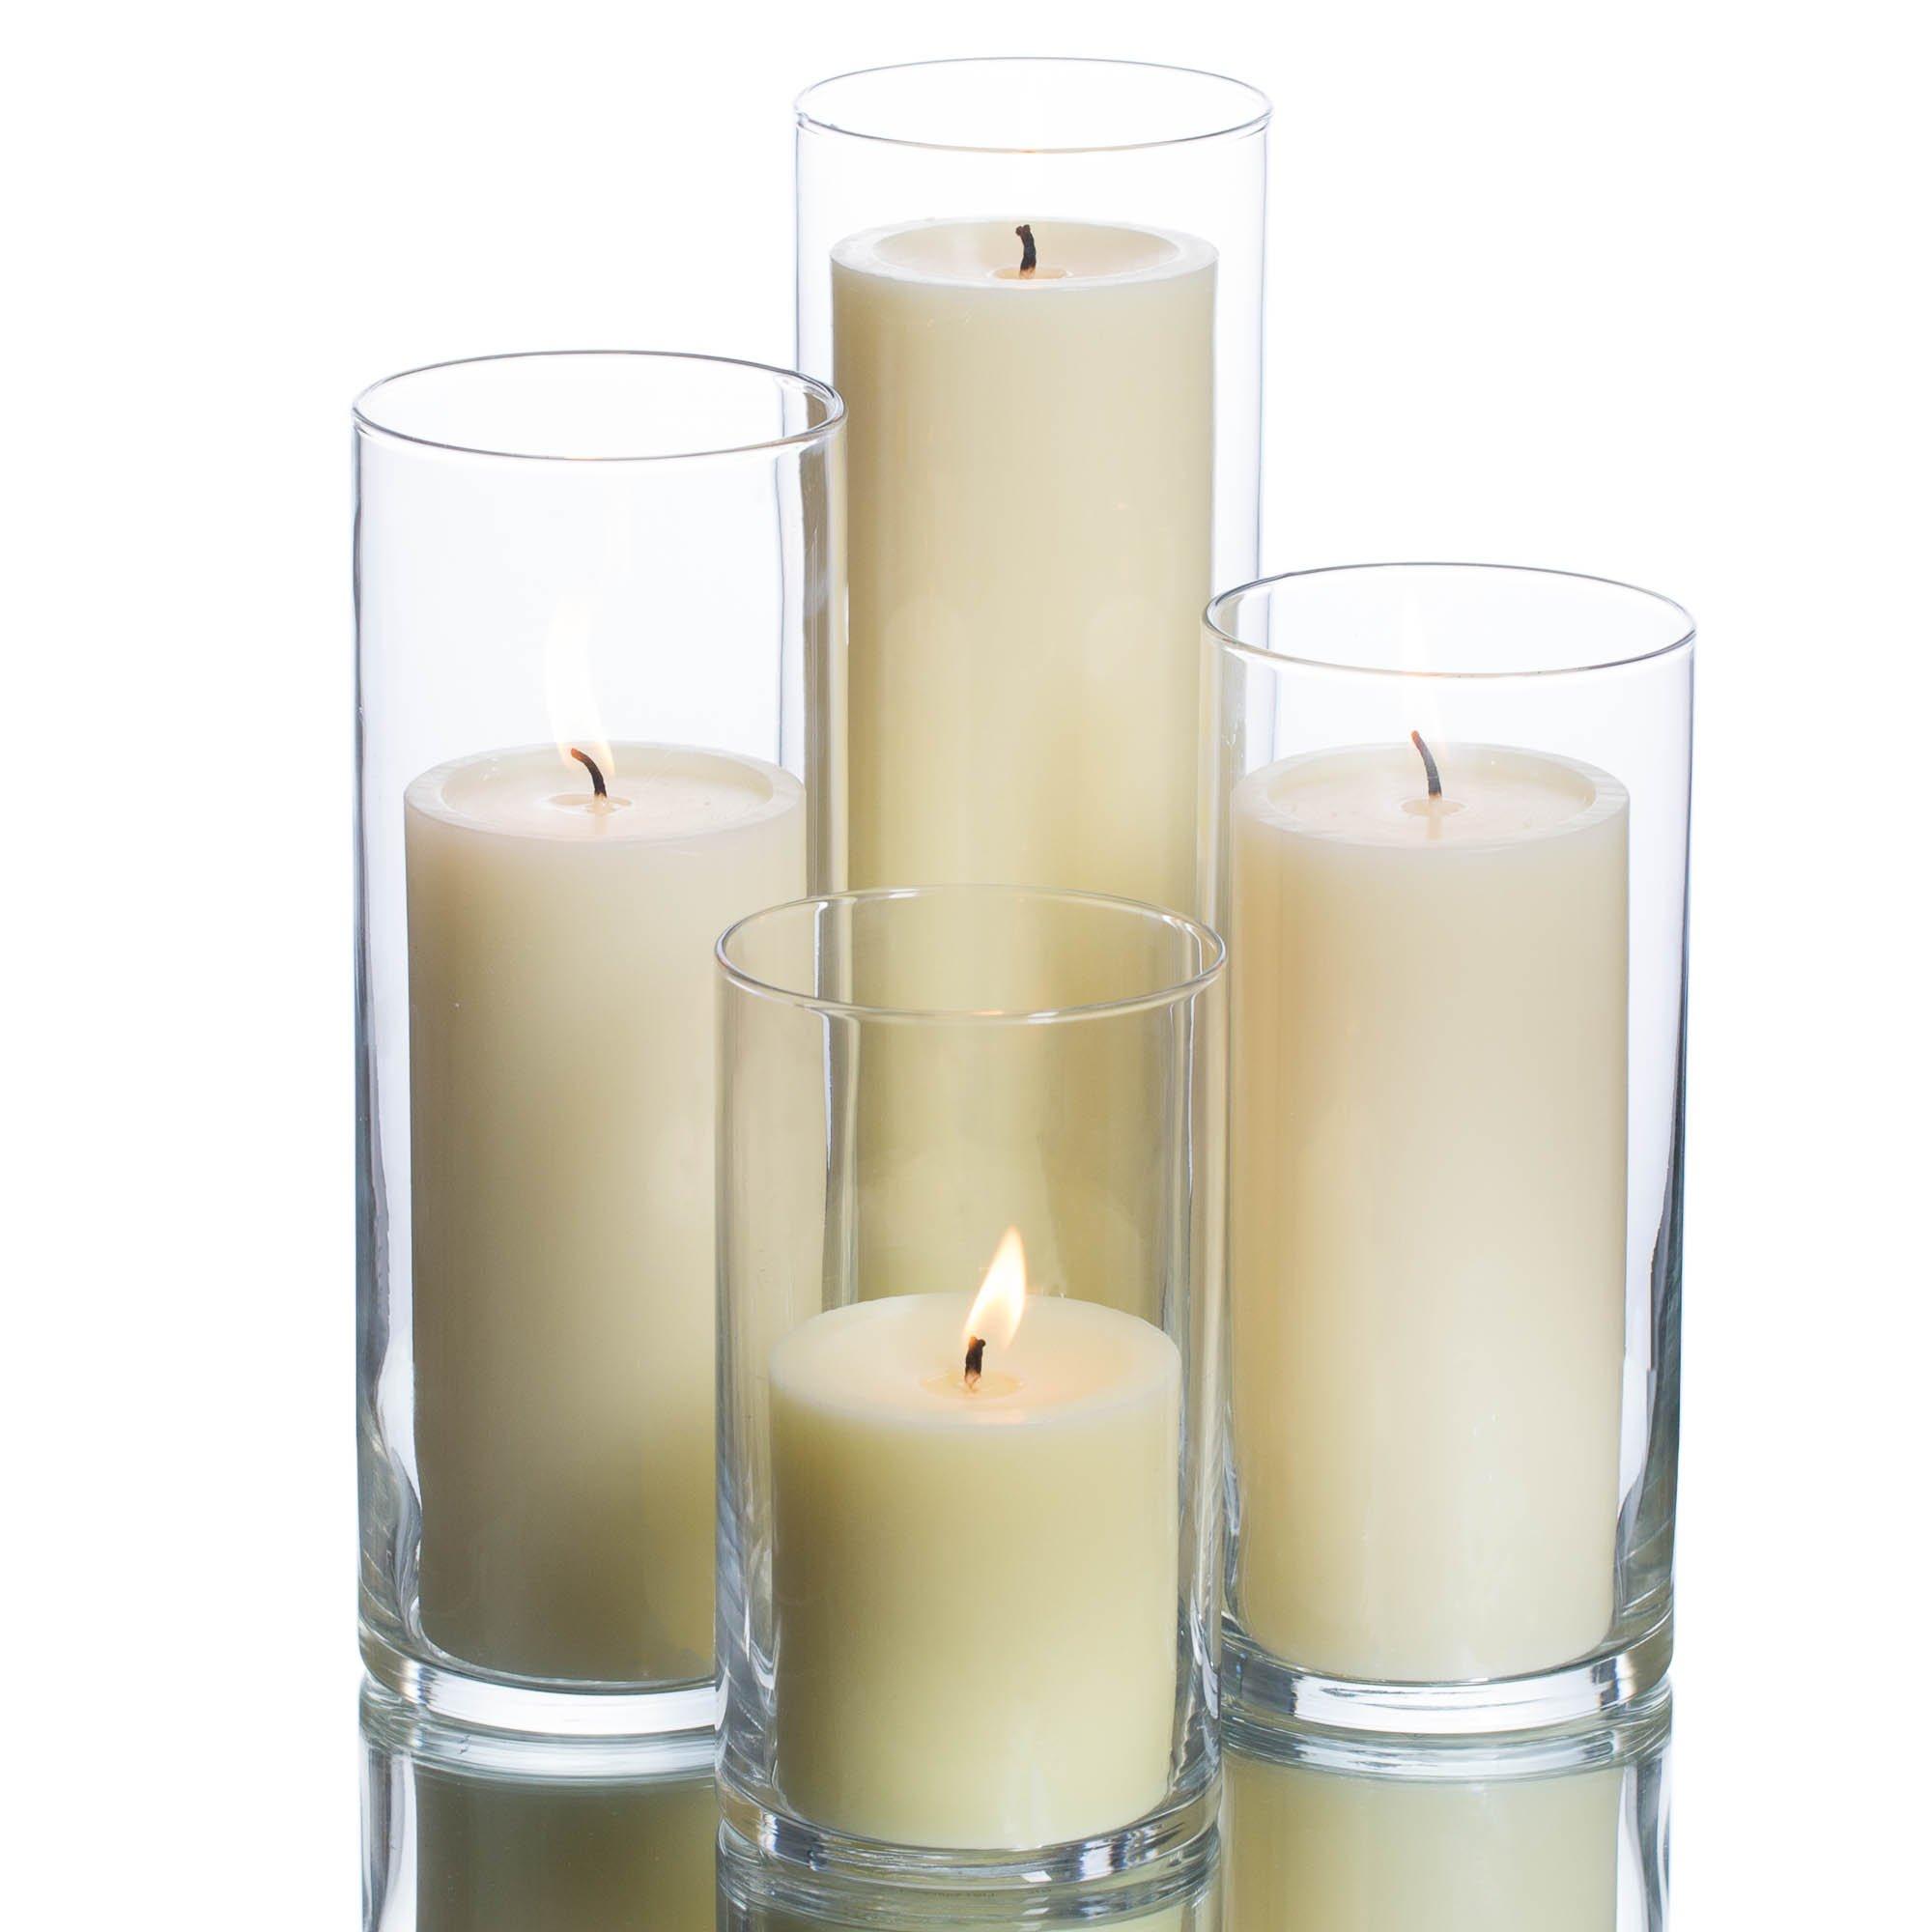 Eastland Cylinder Pillar Holder & Richland Pillar Candles Ivory Set of 48